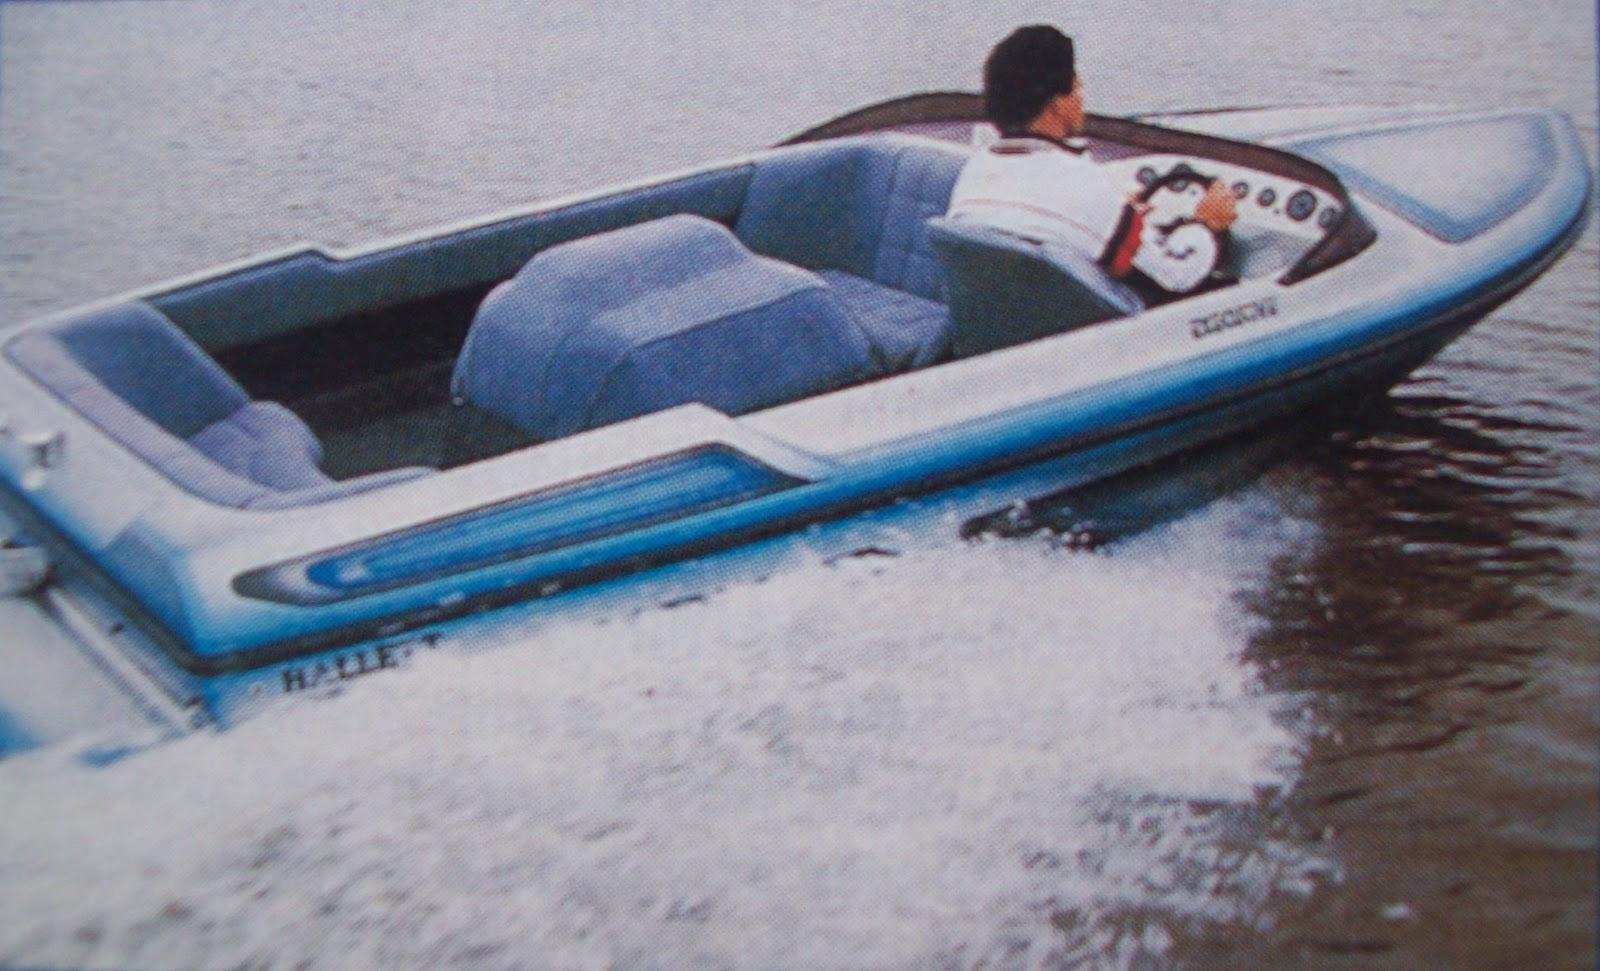 Mud Boats For Sale >> AUSSIE SKIBOATS: random; HALLETT EXECUTIVE